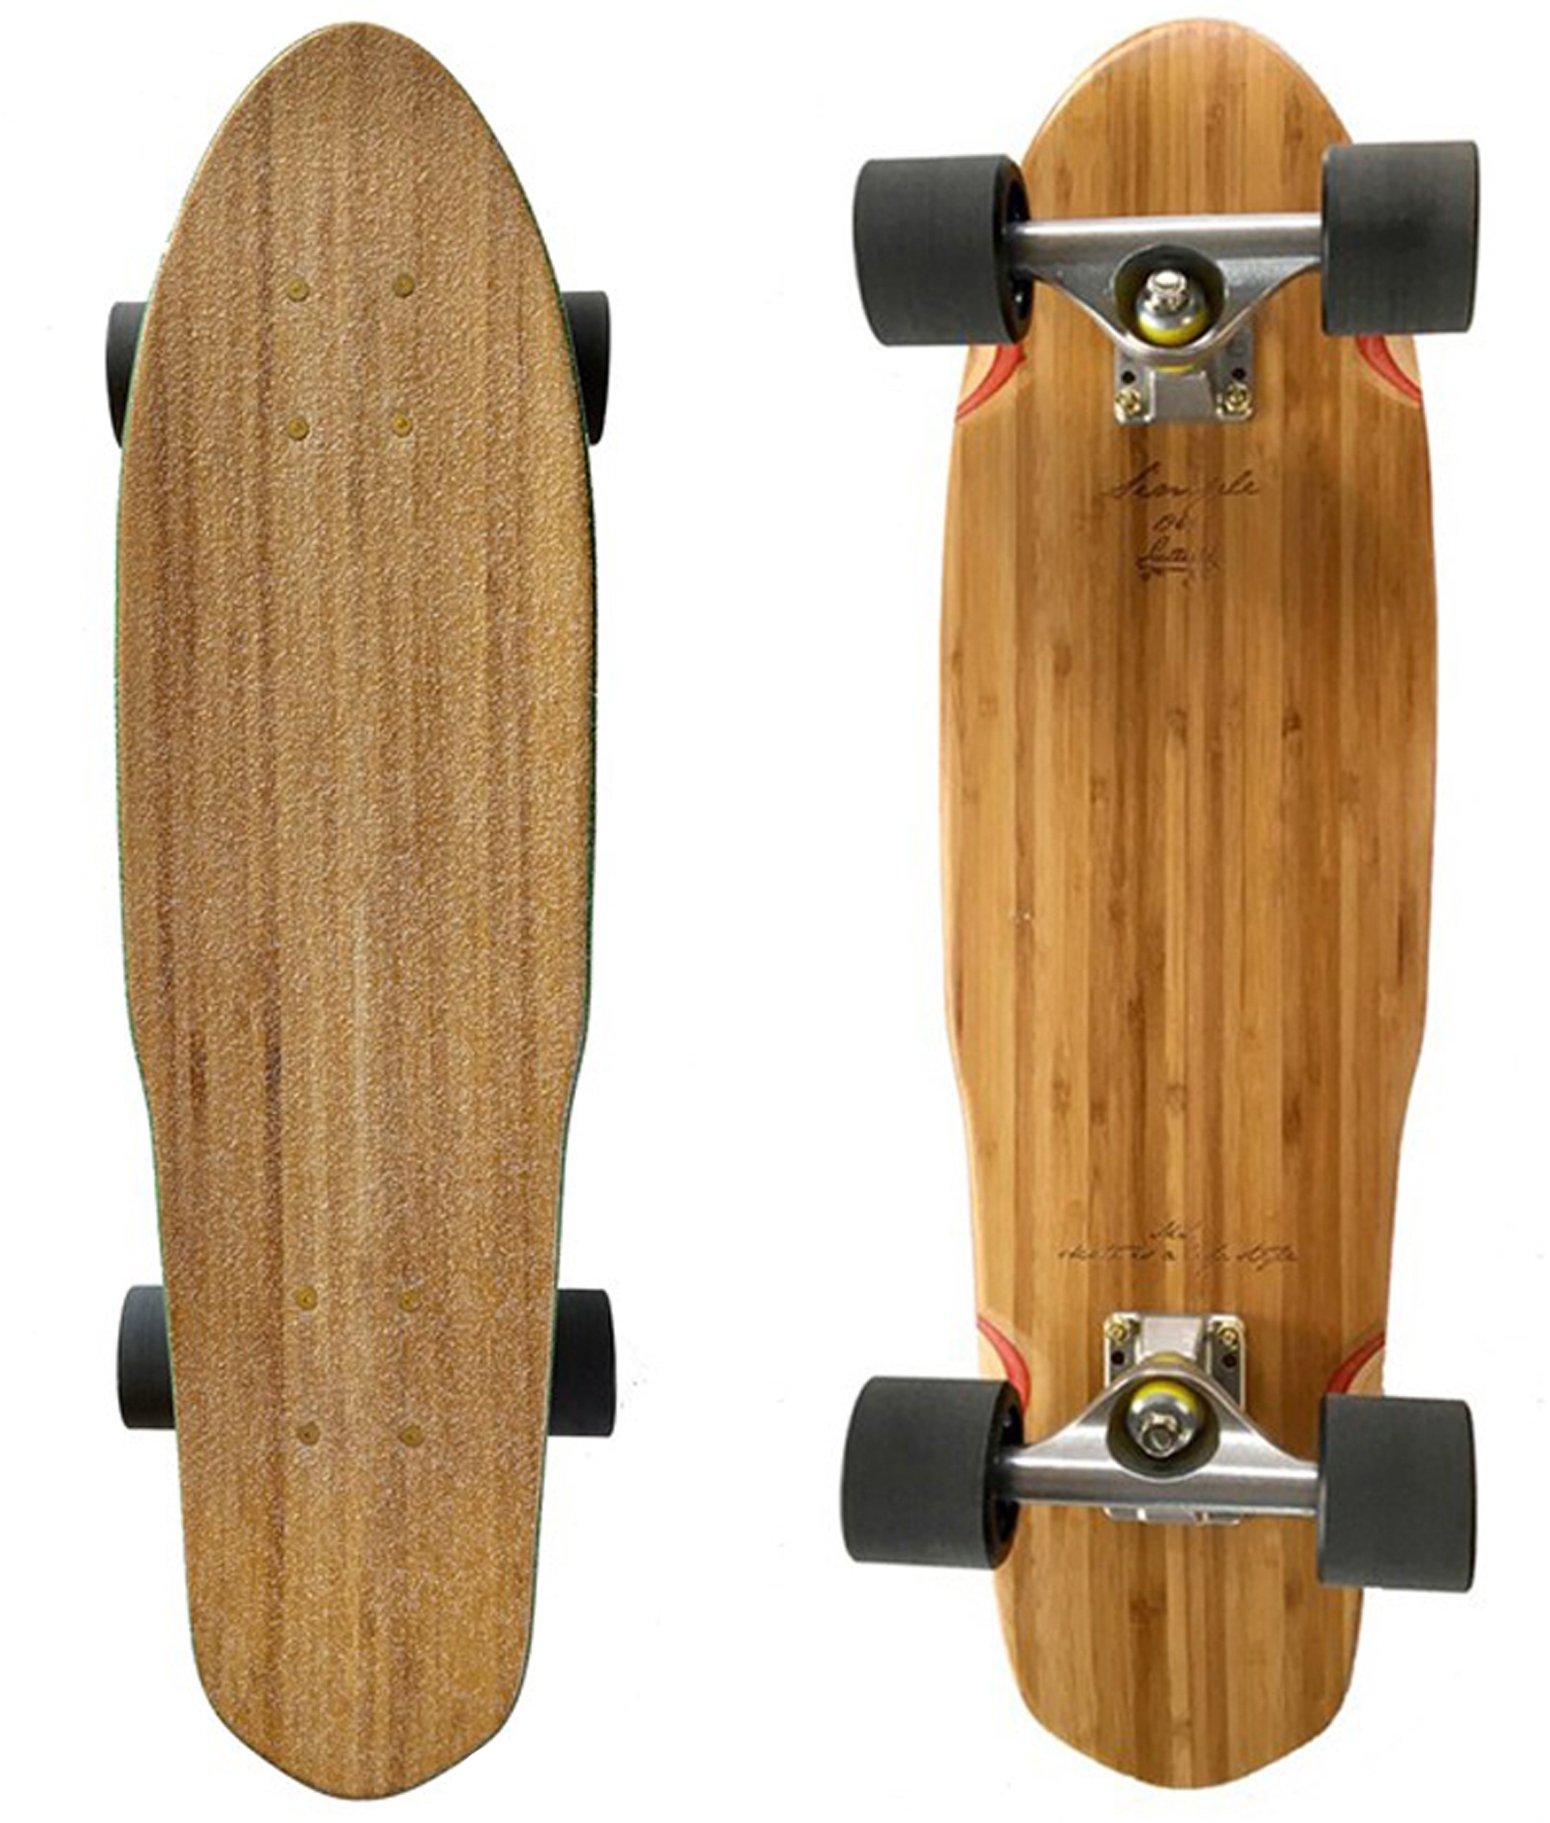 LMAI 27'' Bamboo Wood Cruiser Complete Skateboard (Clear Grip)